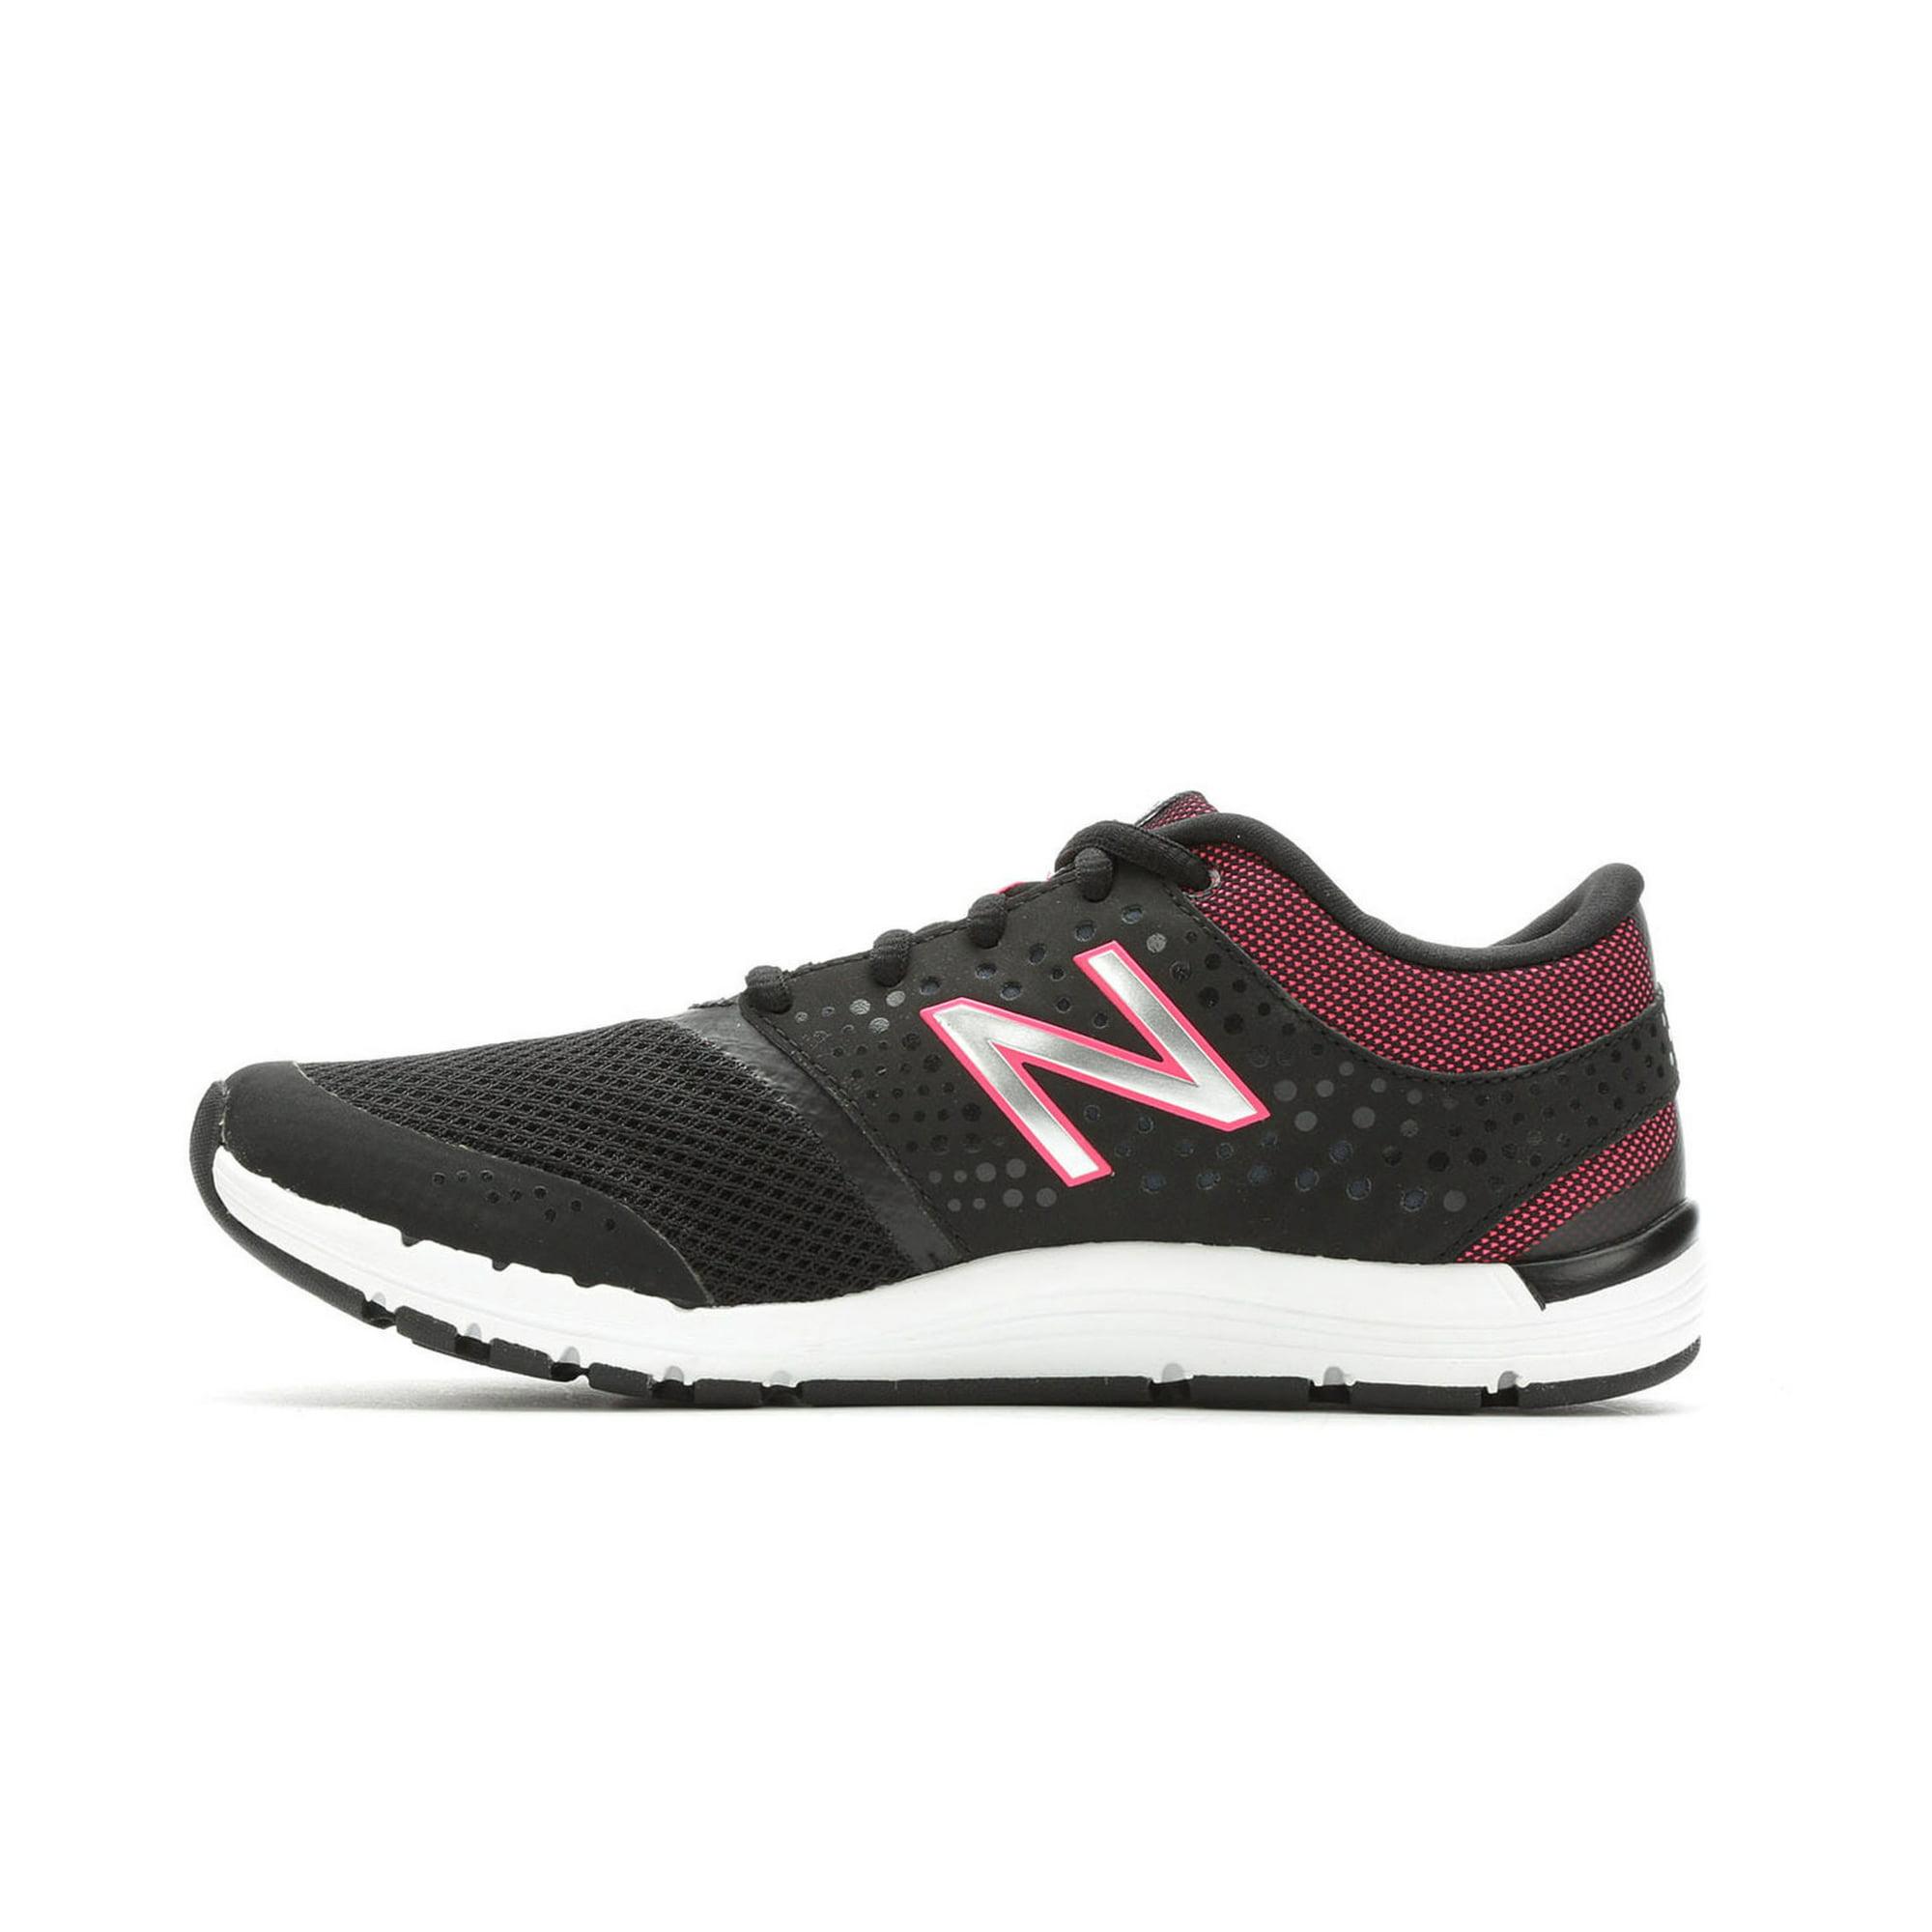 Serpiente dolor Múltiple  New Balance Womens wx577bp4 Low Top Lace Up Running Sneaker | Walmart Canada